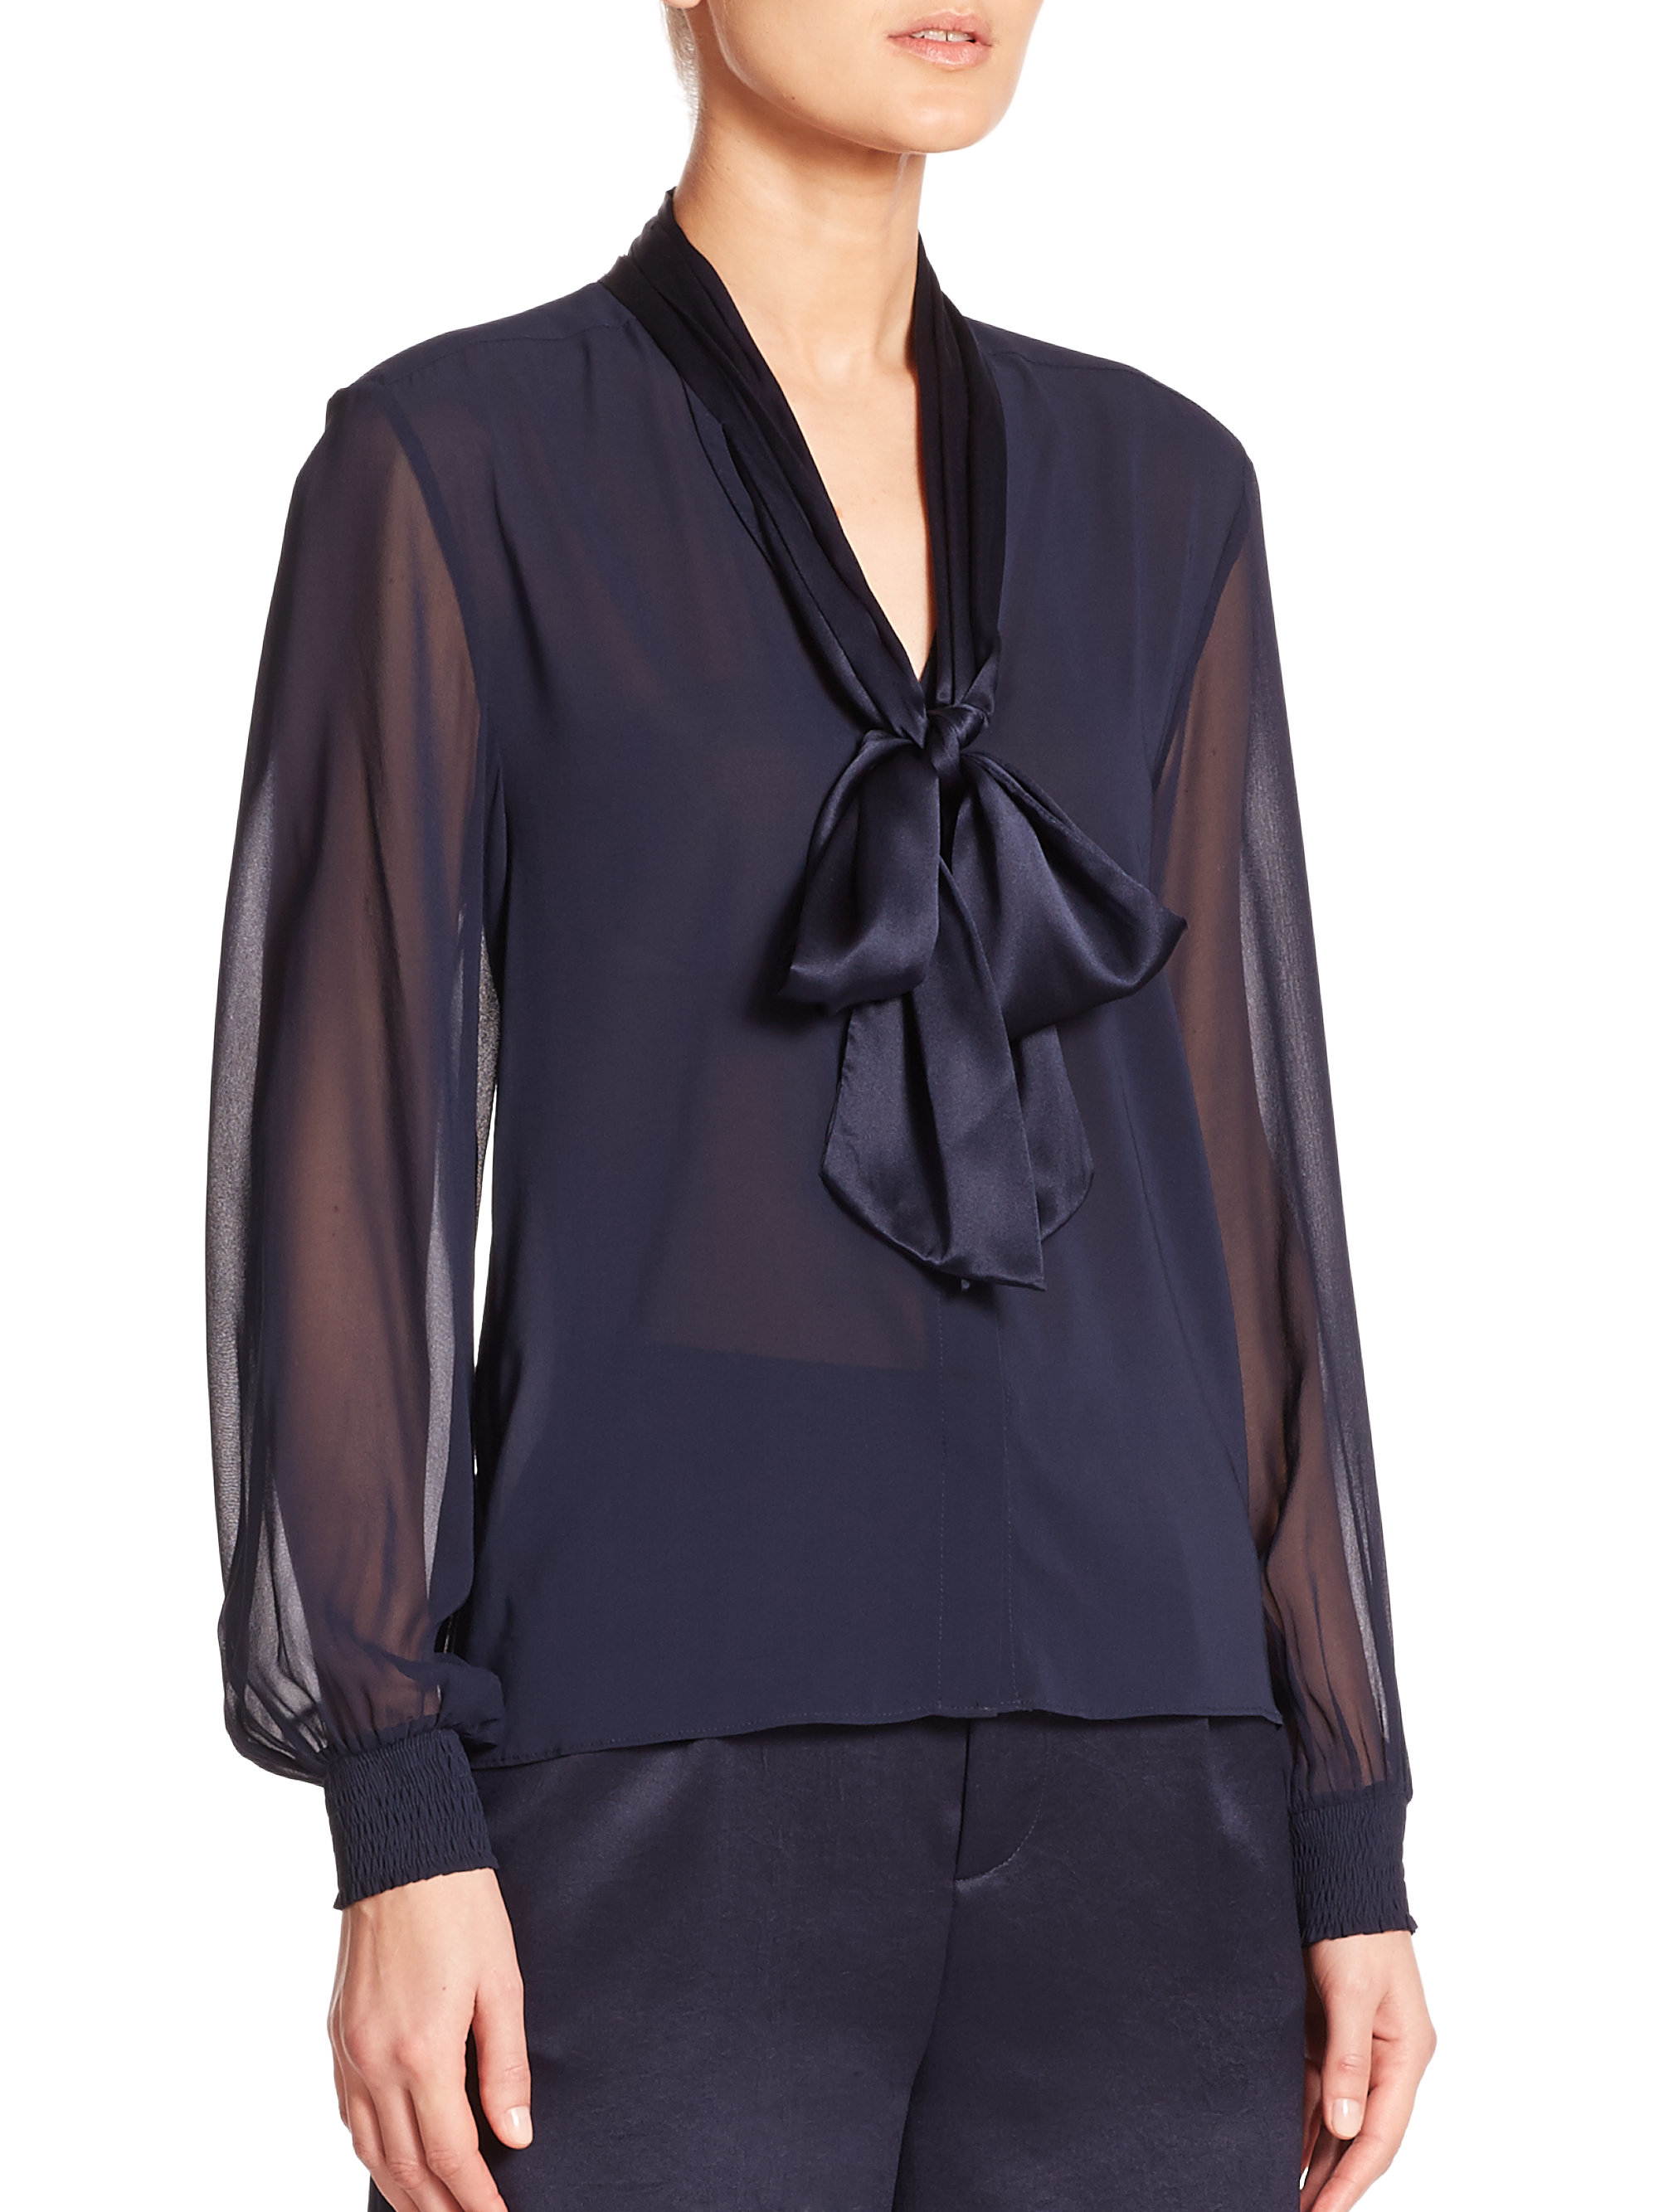 a7efc2c9c04f9 Lyst - Alice + Olivia Devin Silk Tie-Neck Blosue in Blue